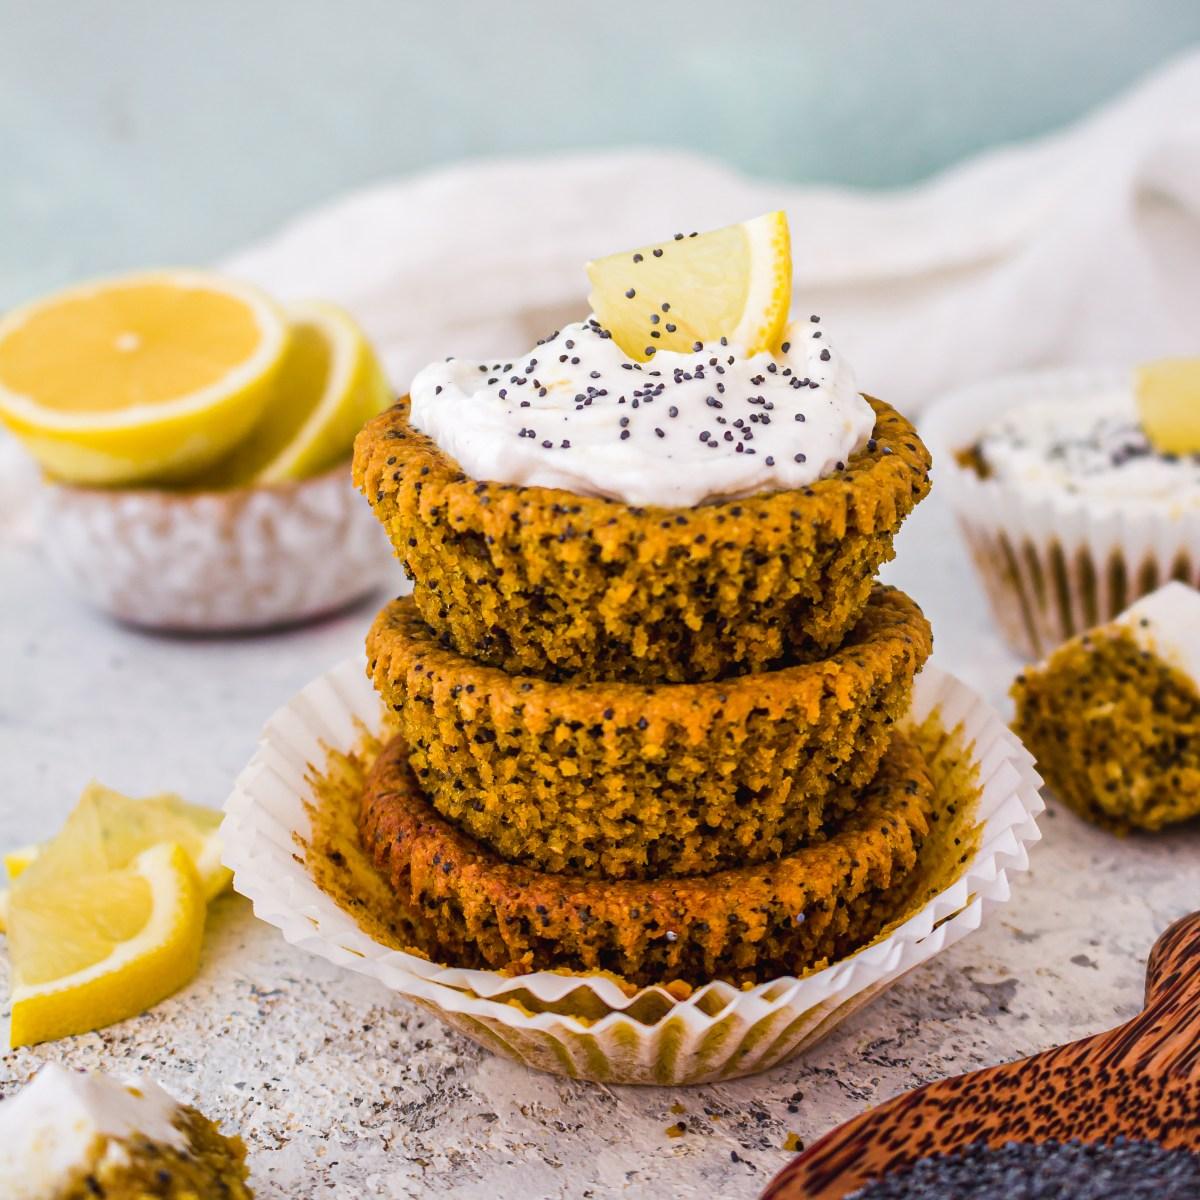 Lemon Turmeric and Poppyseed Muffins